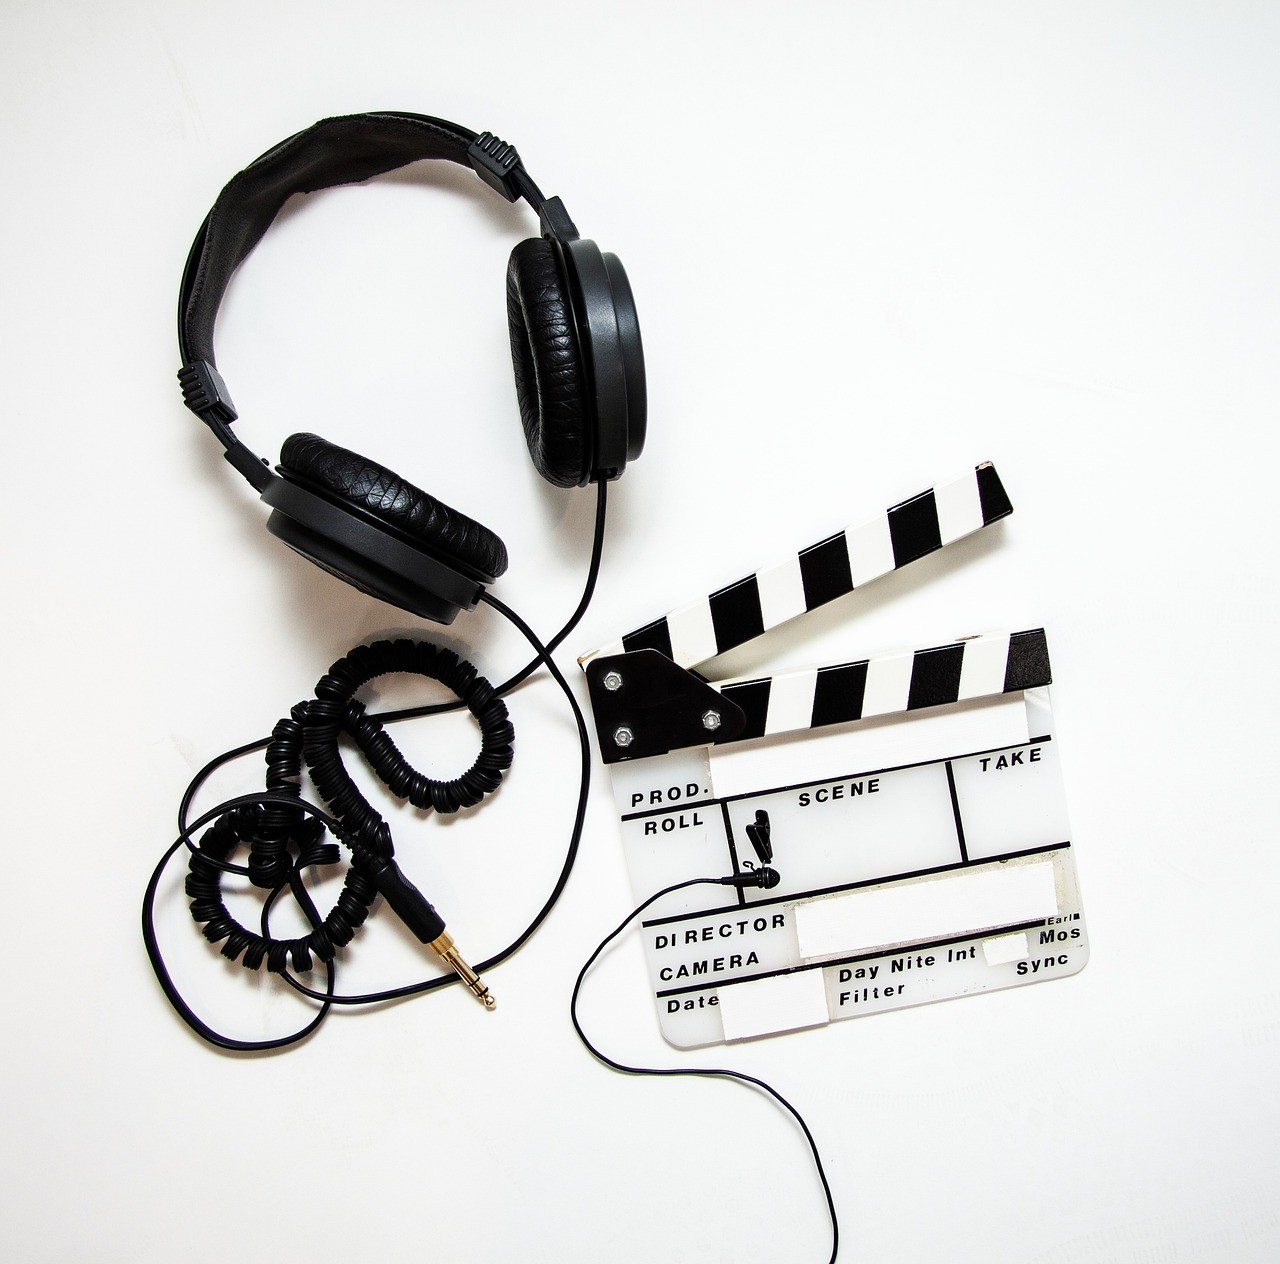 video-production-4223911_1280.jpg